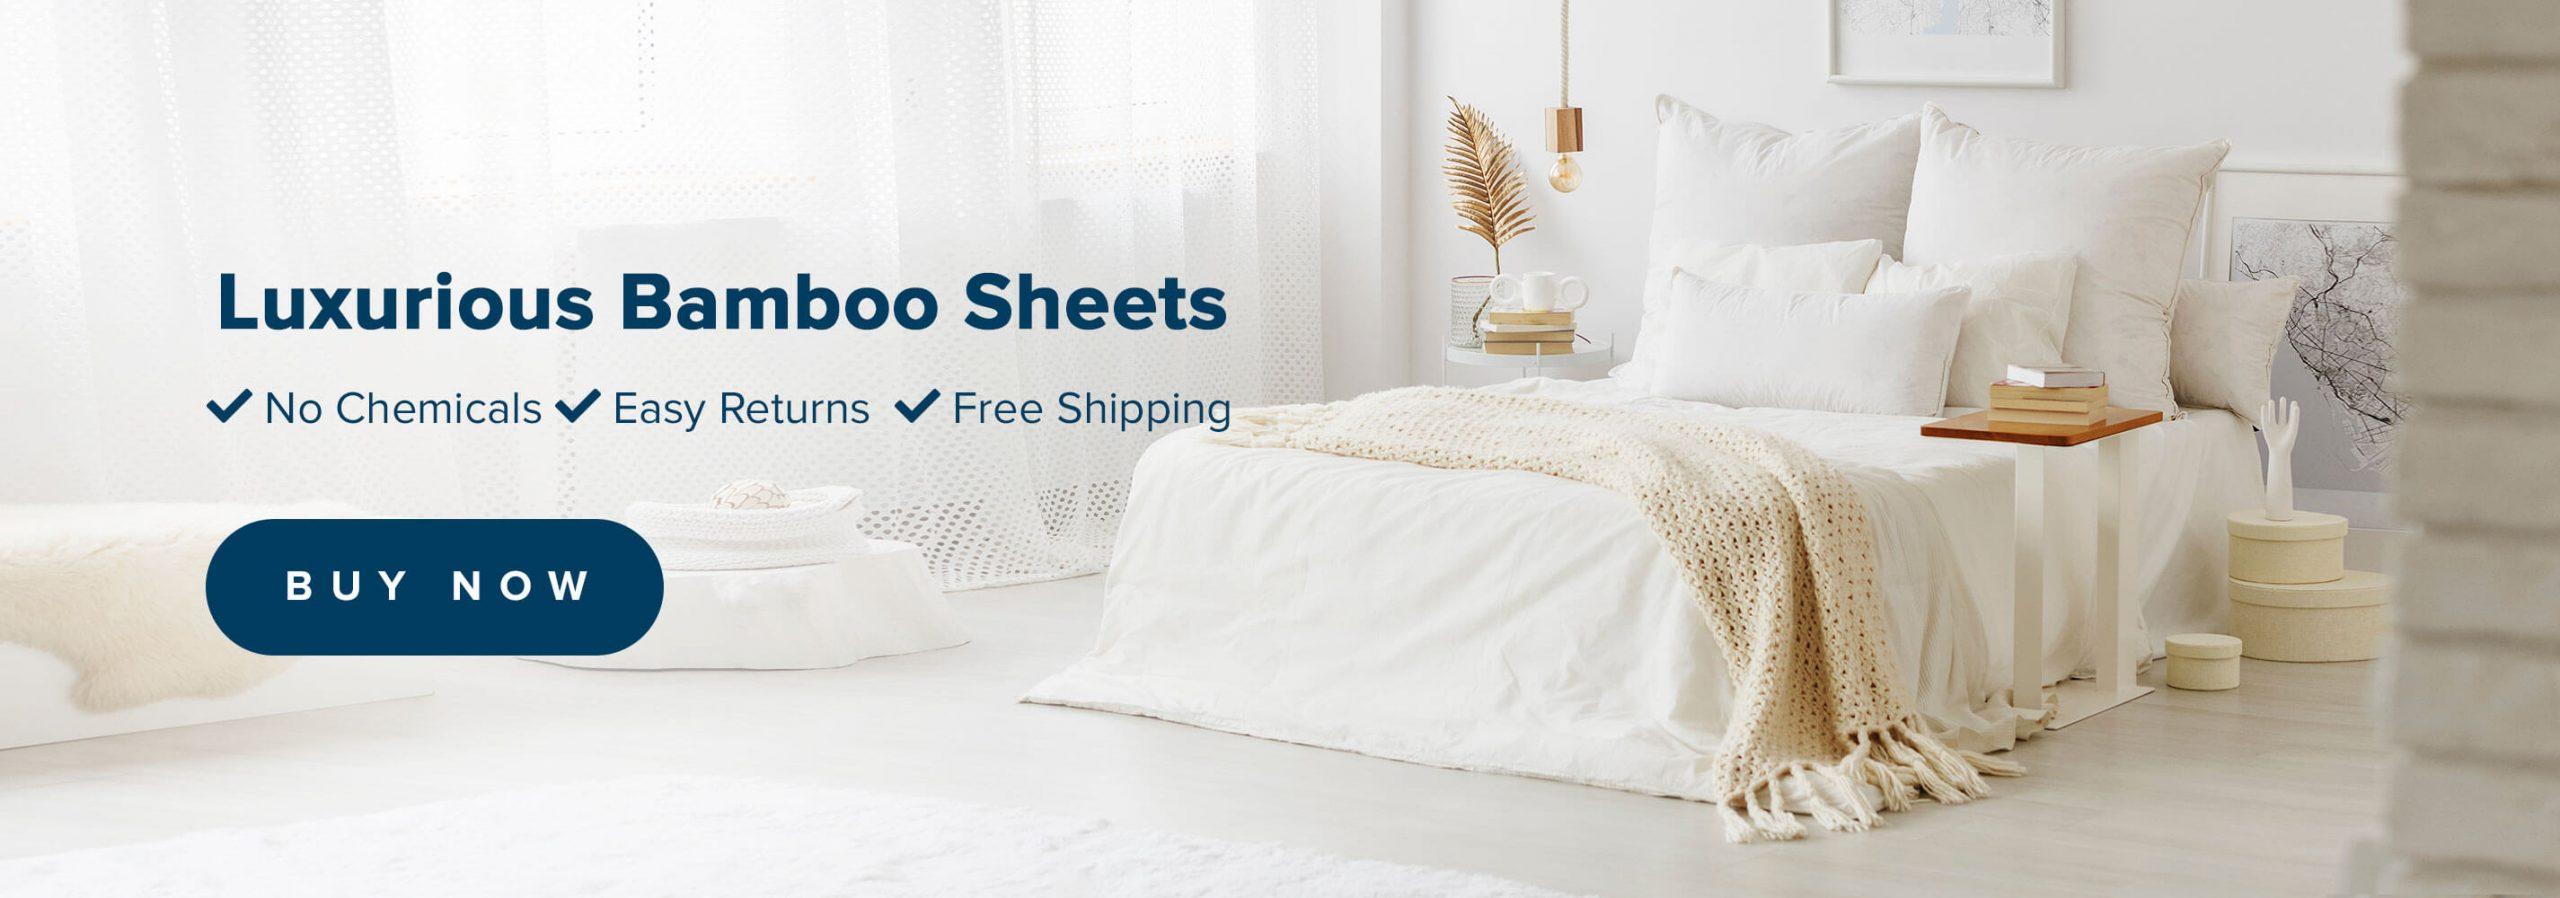 Luxurious Bamboo Sheets